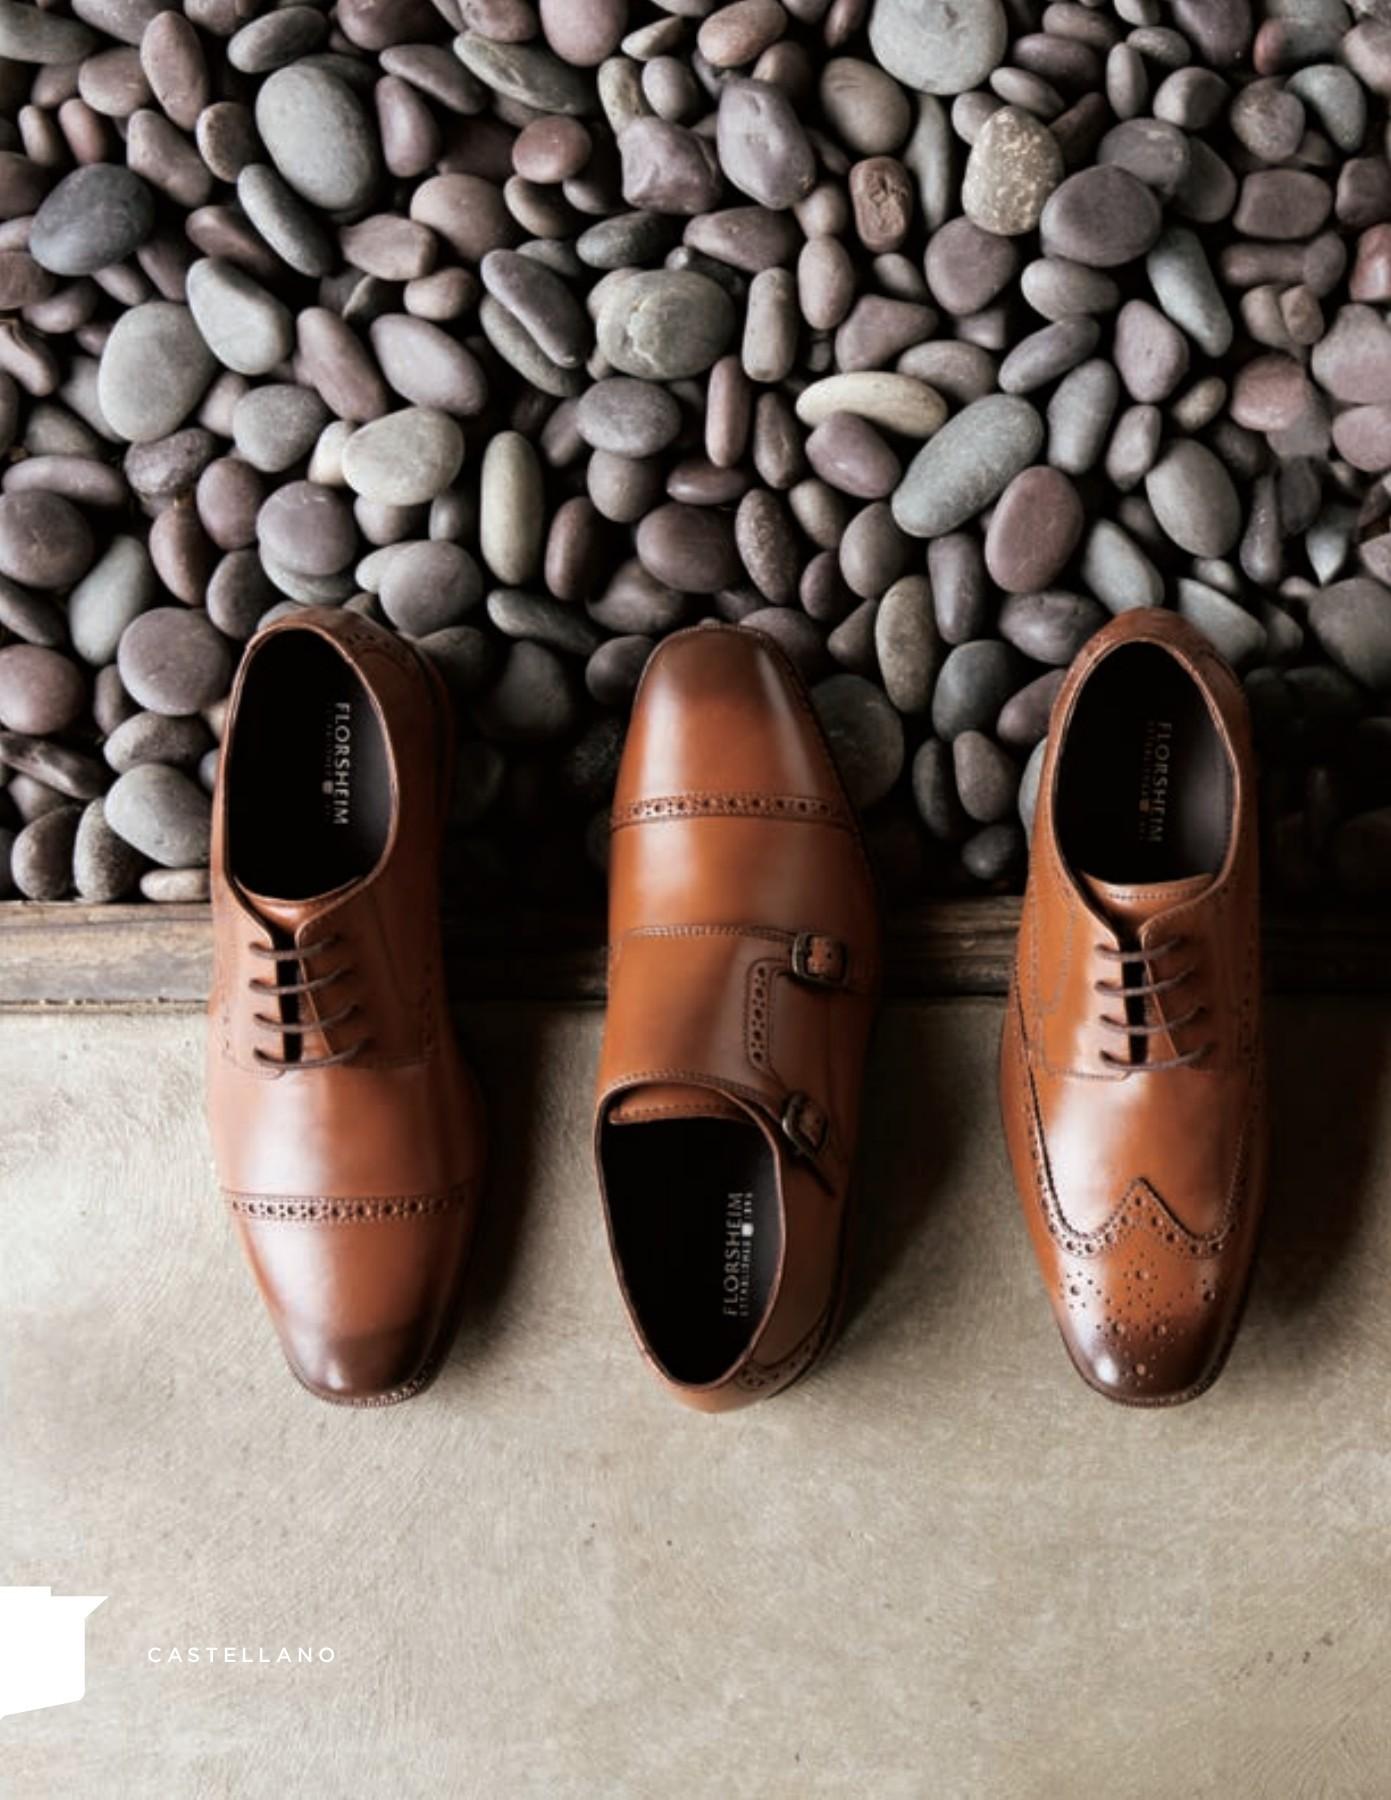 Florsheim DUKE BOOT 17087-03 Cognac Leather Bike Toe Side Zip Dress Boot Shoes